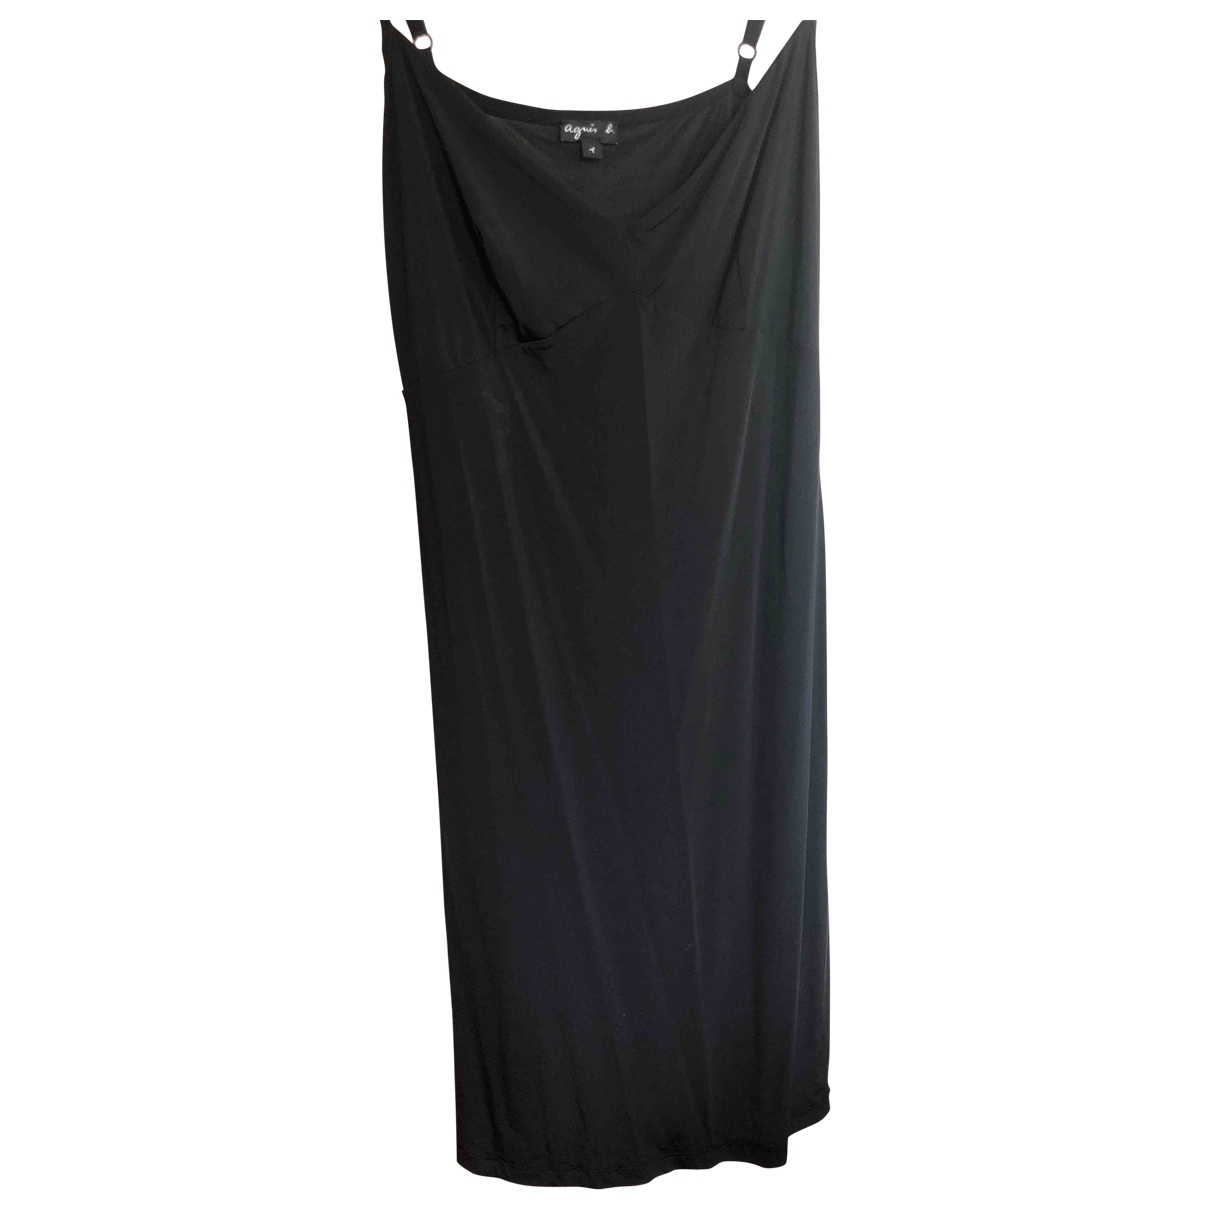 Agnès B. \N Black Cotton - elasthane skirt for Women 36 FR